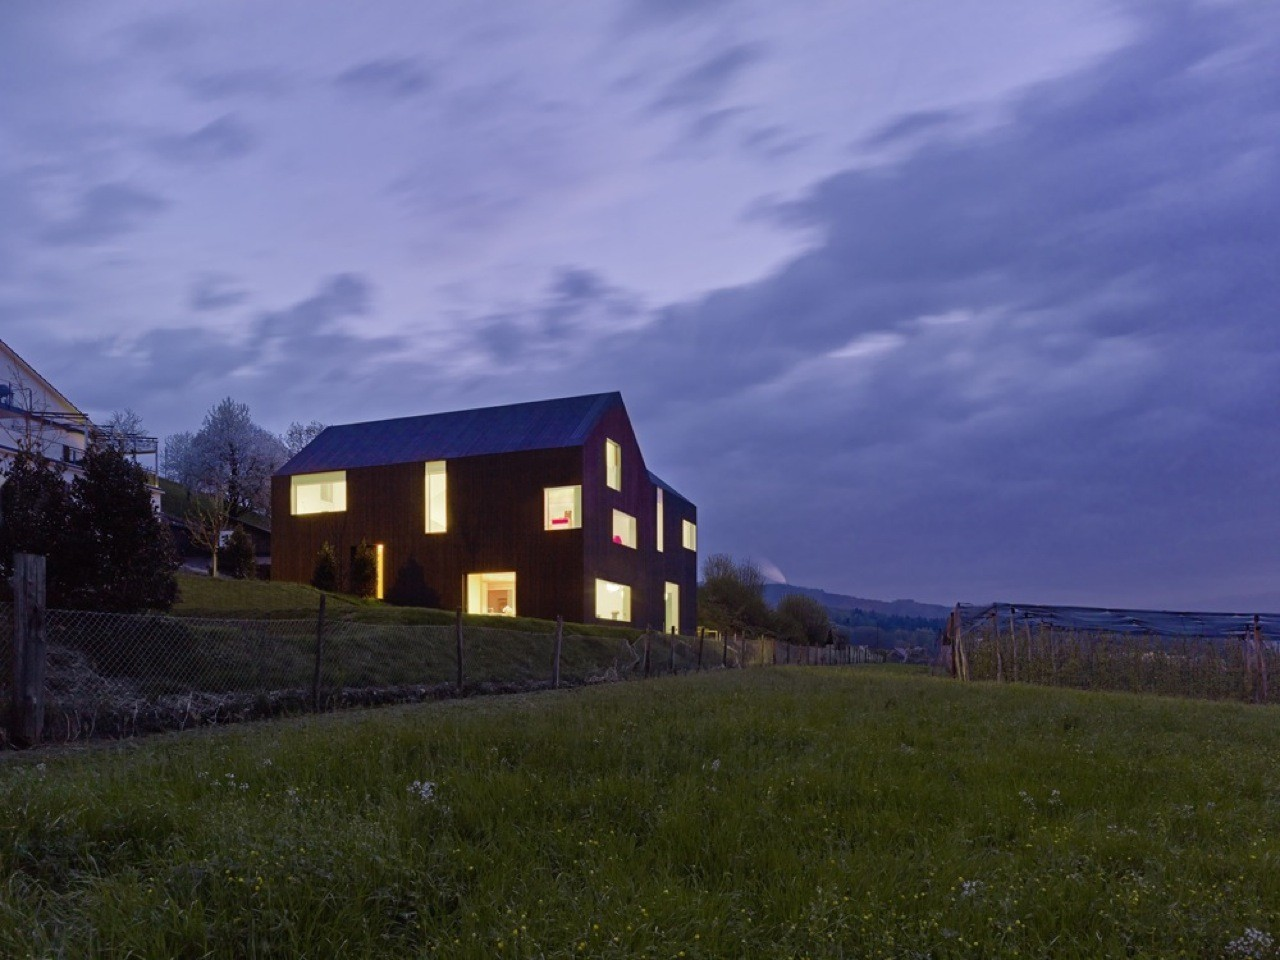 galer a de gottshalden rossetti wyss architekten 6. Black Bedroom Furniture Sets. Home Design Ideas